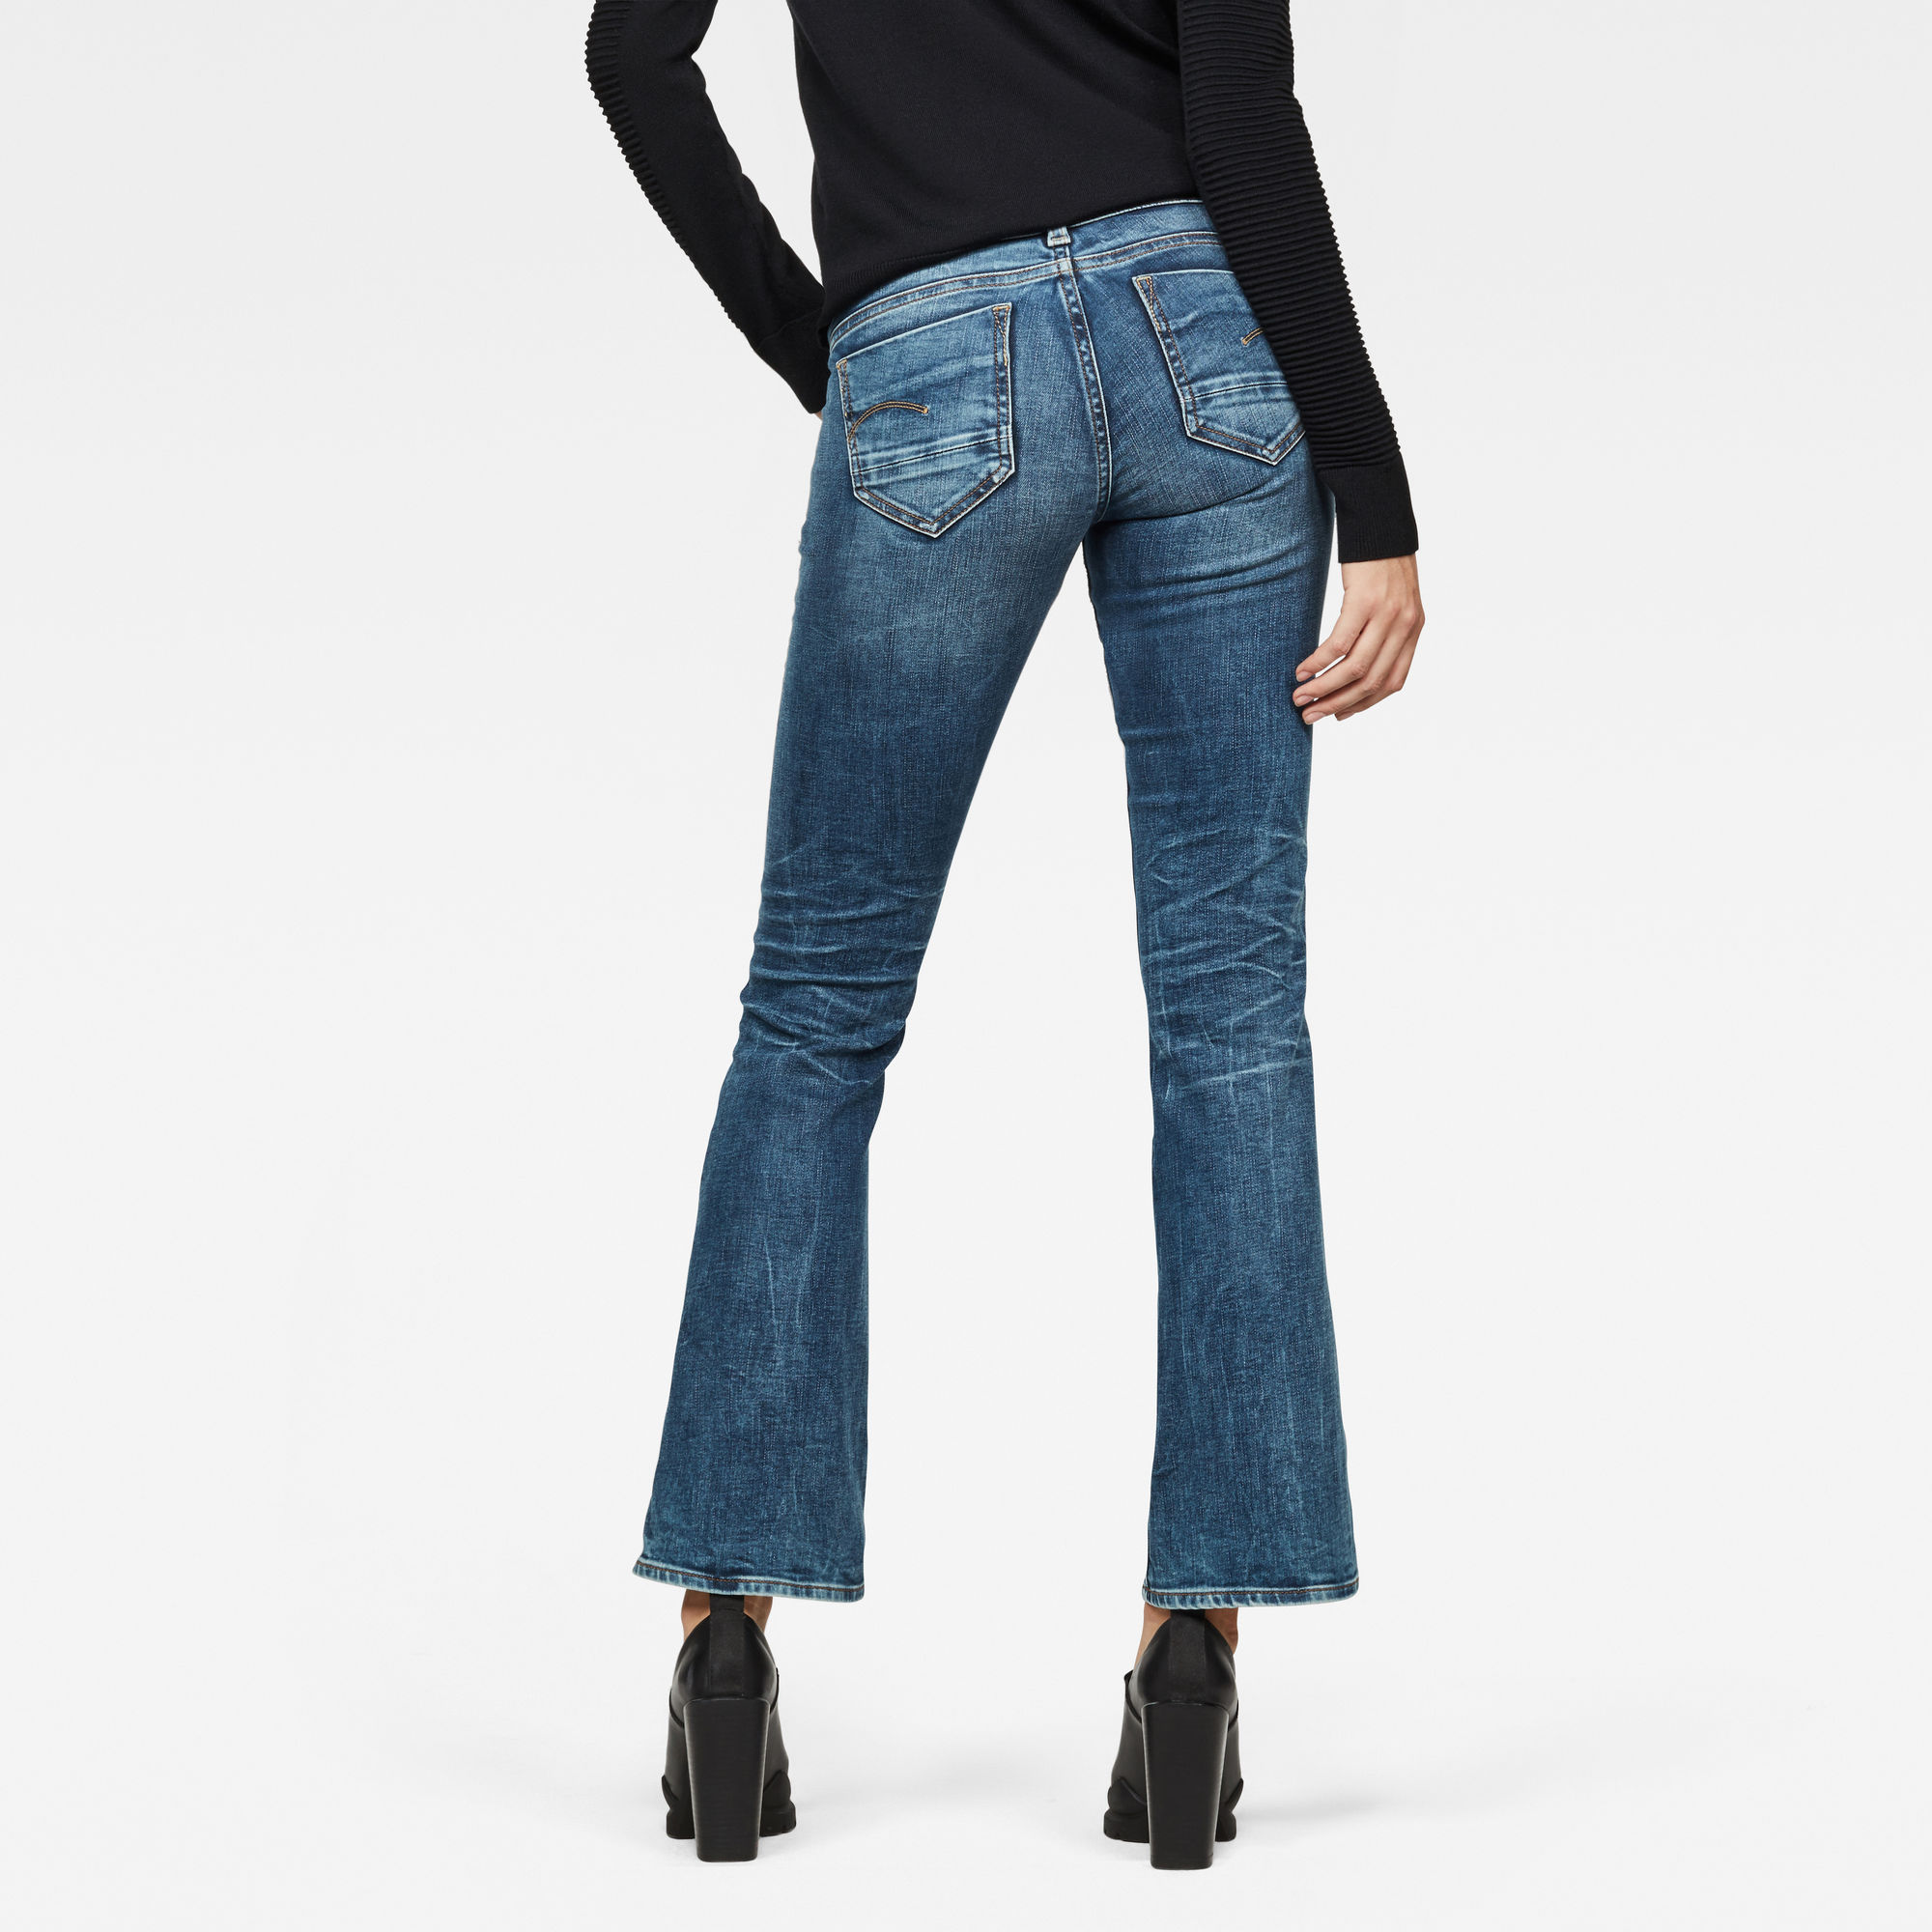 Midge Saddle Mid Skinny Bootcut Jeans Jeans maat 23-32 van G-Star RAW snel en voordelig in huis? Hier lukt het direct